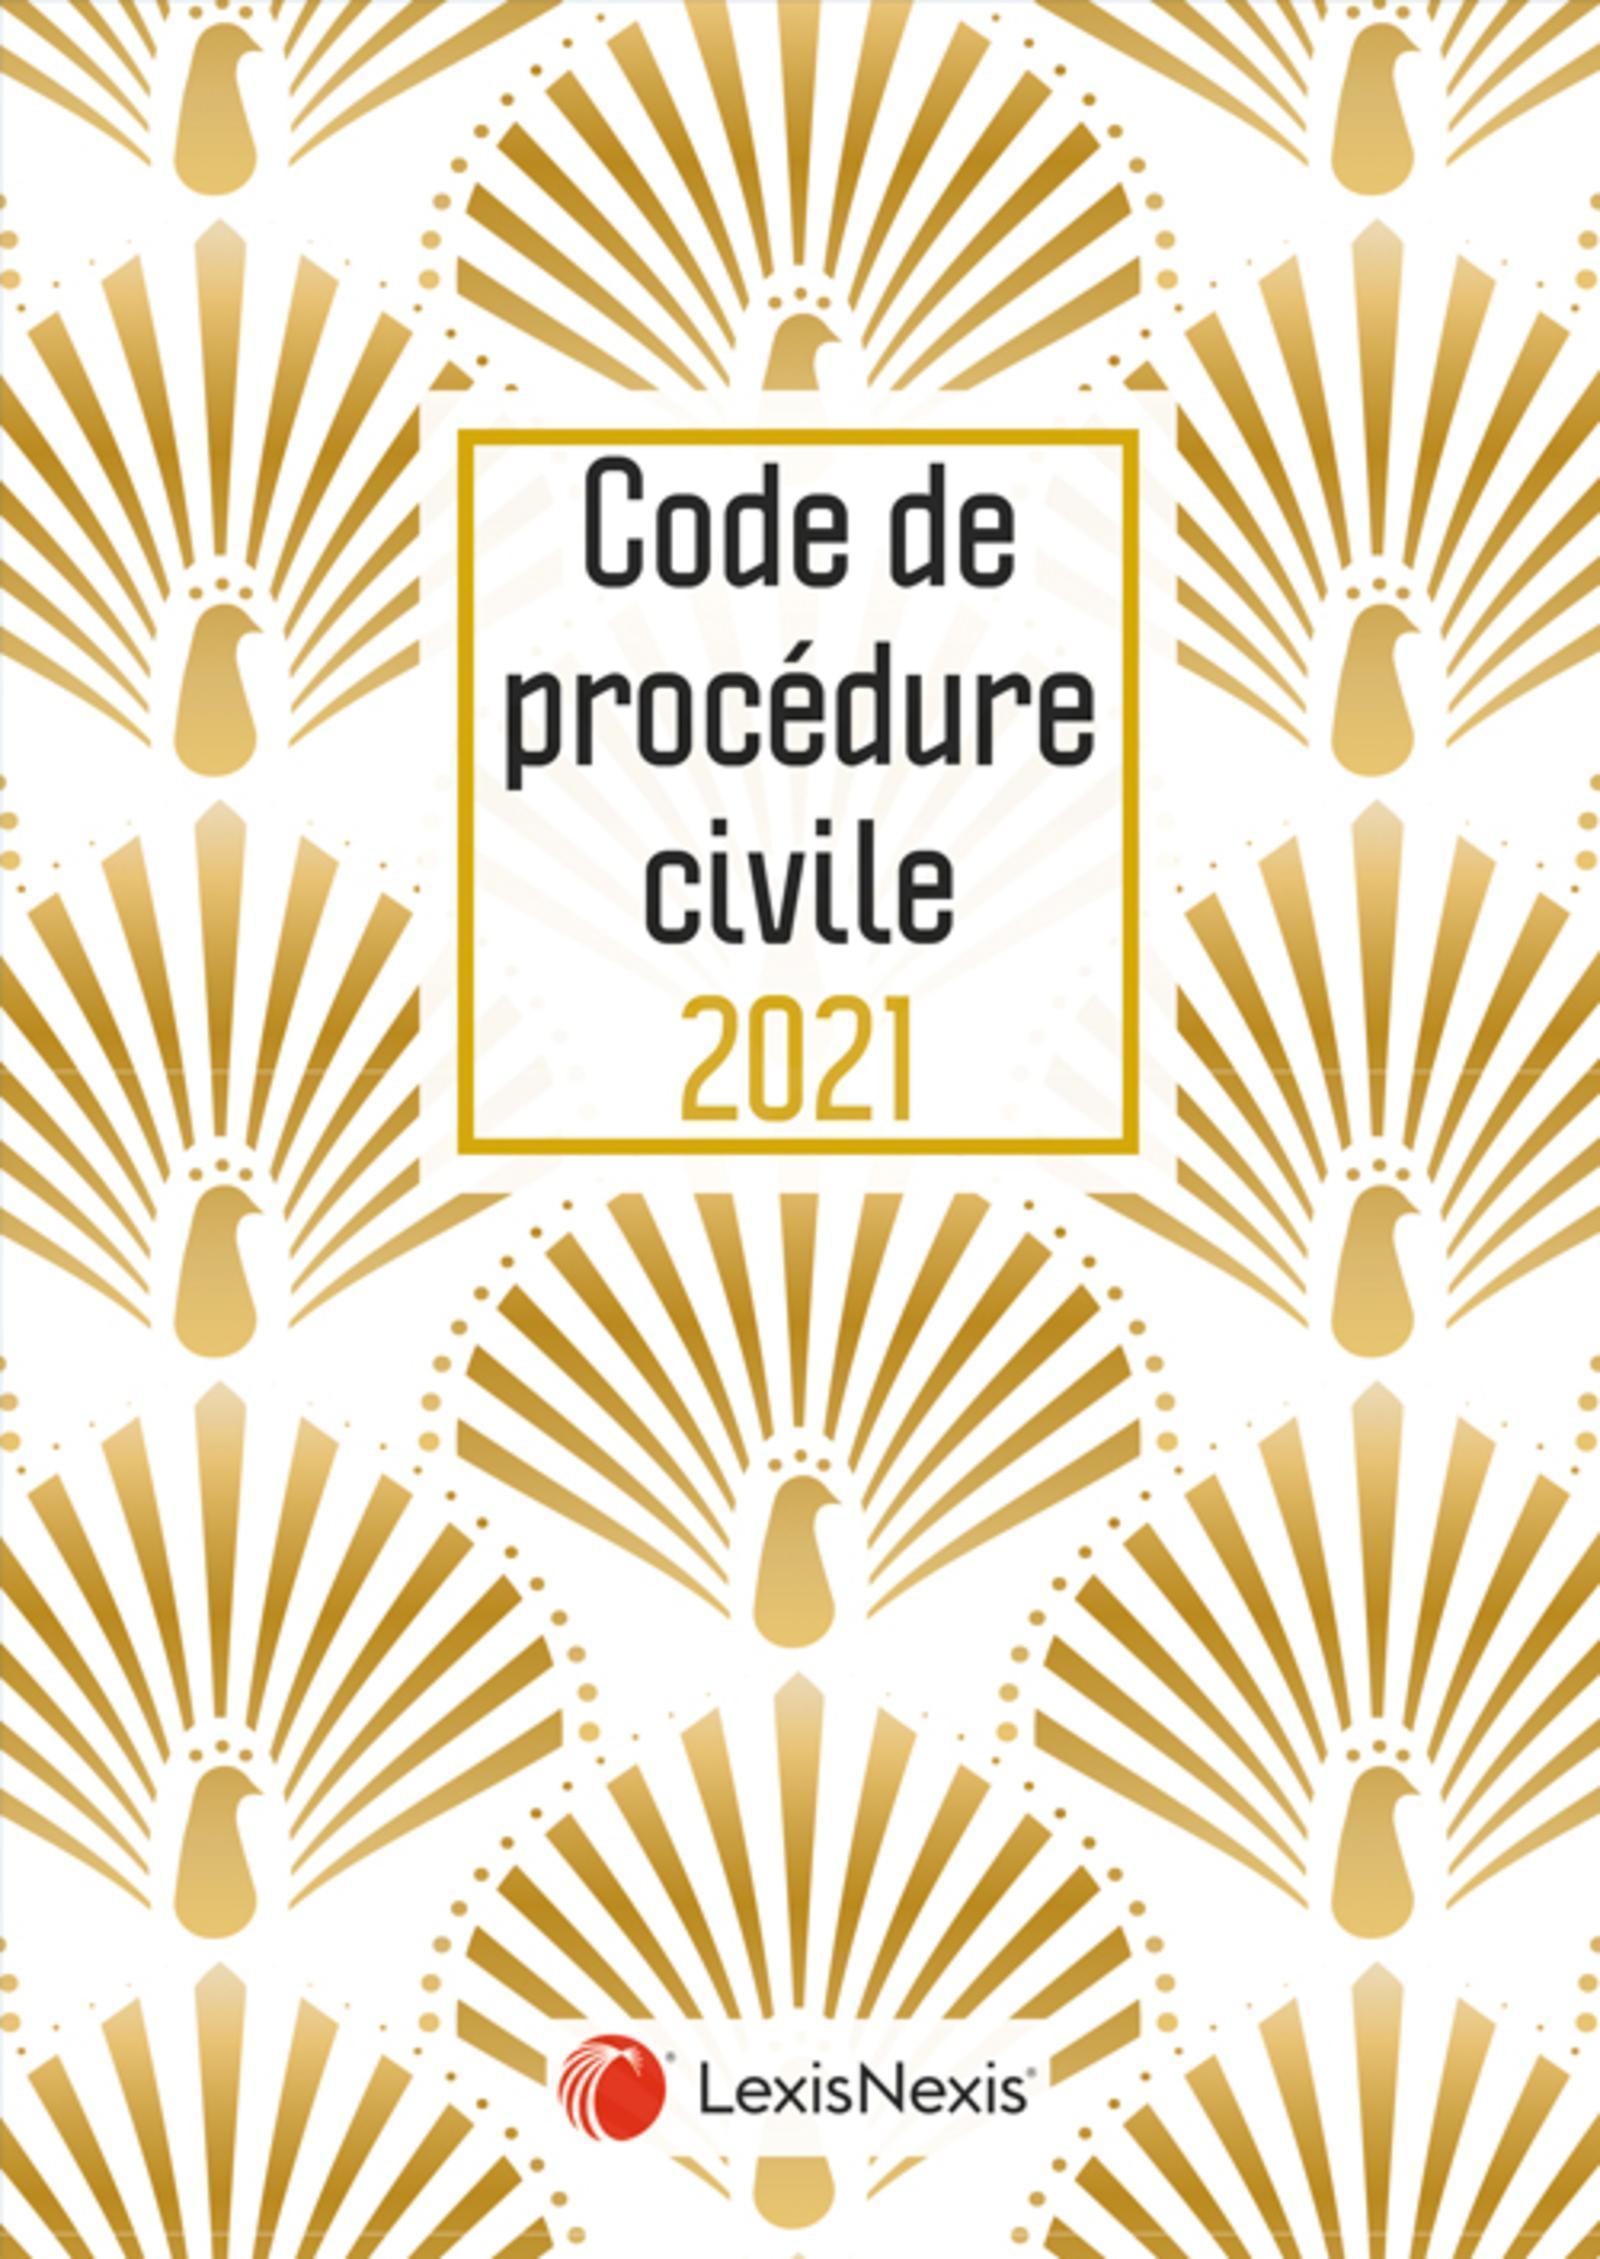 CODE DE PROCEDURE CIVILE 2021- JAQUETTE